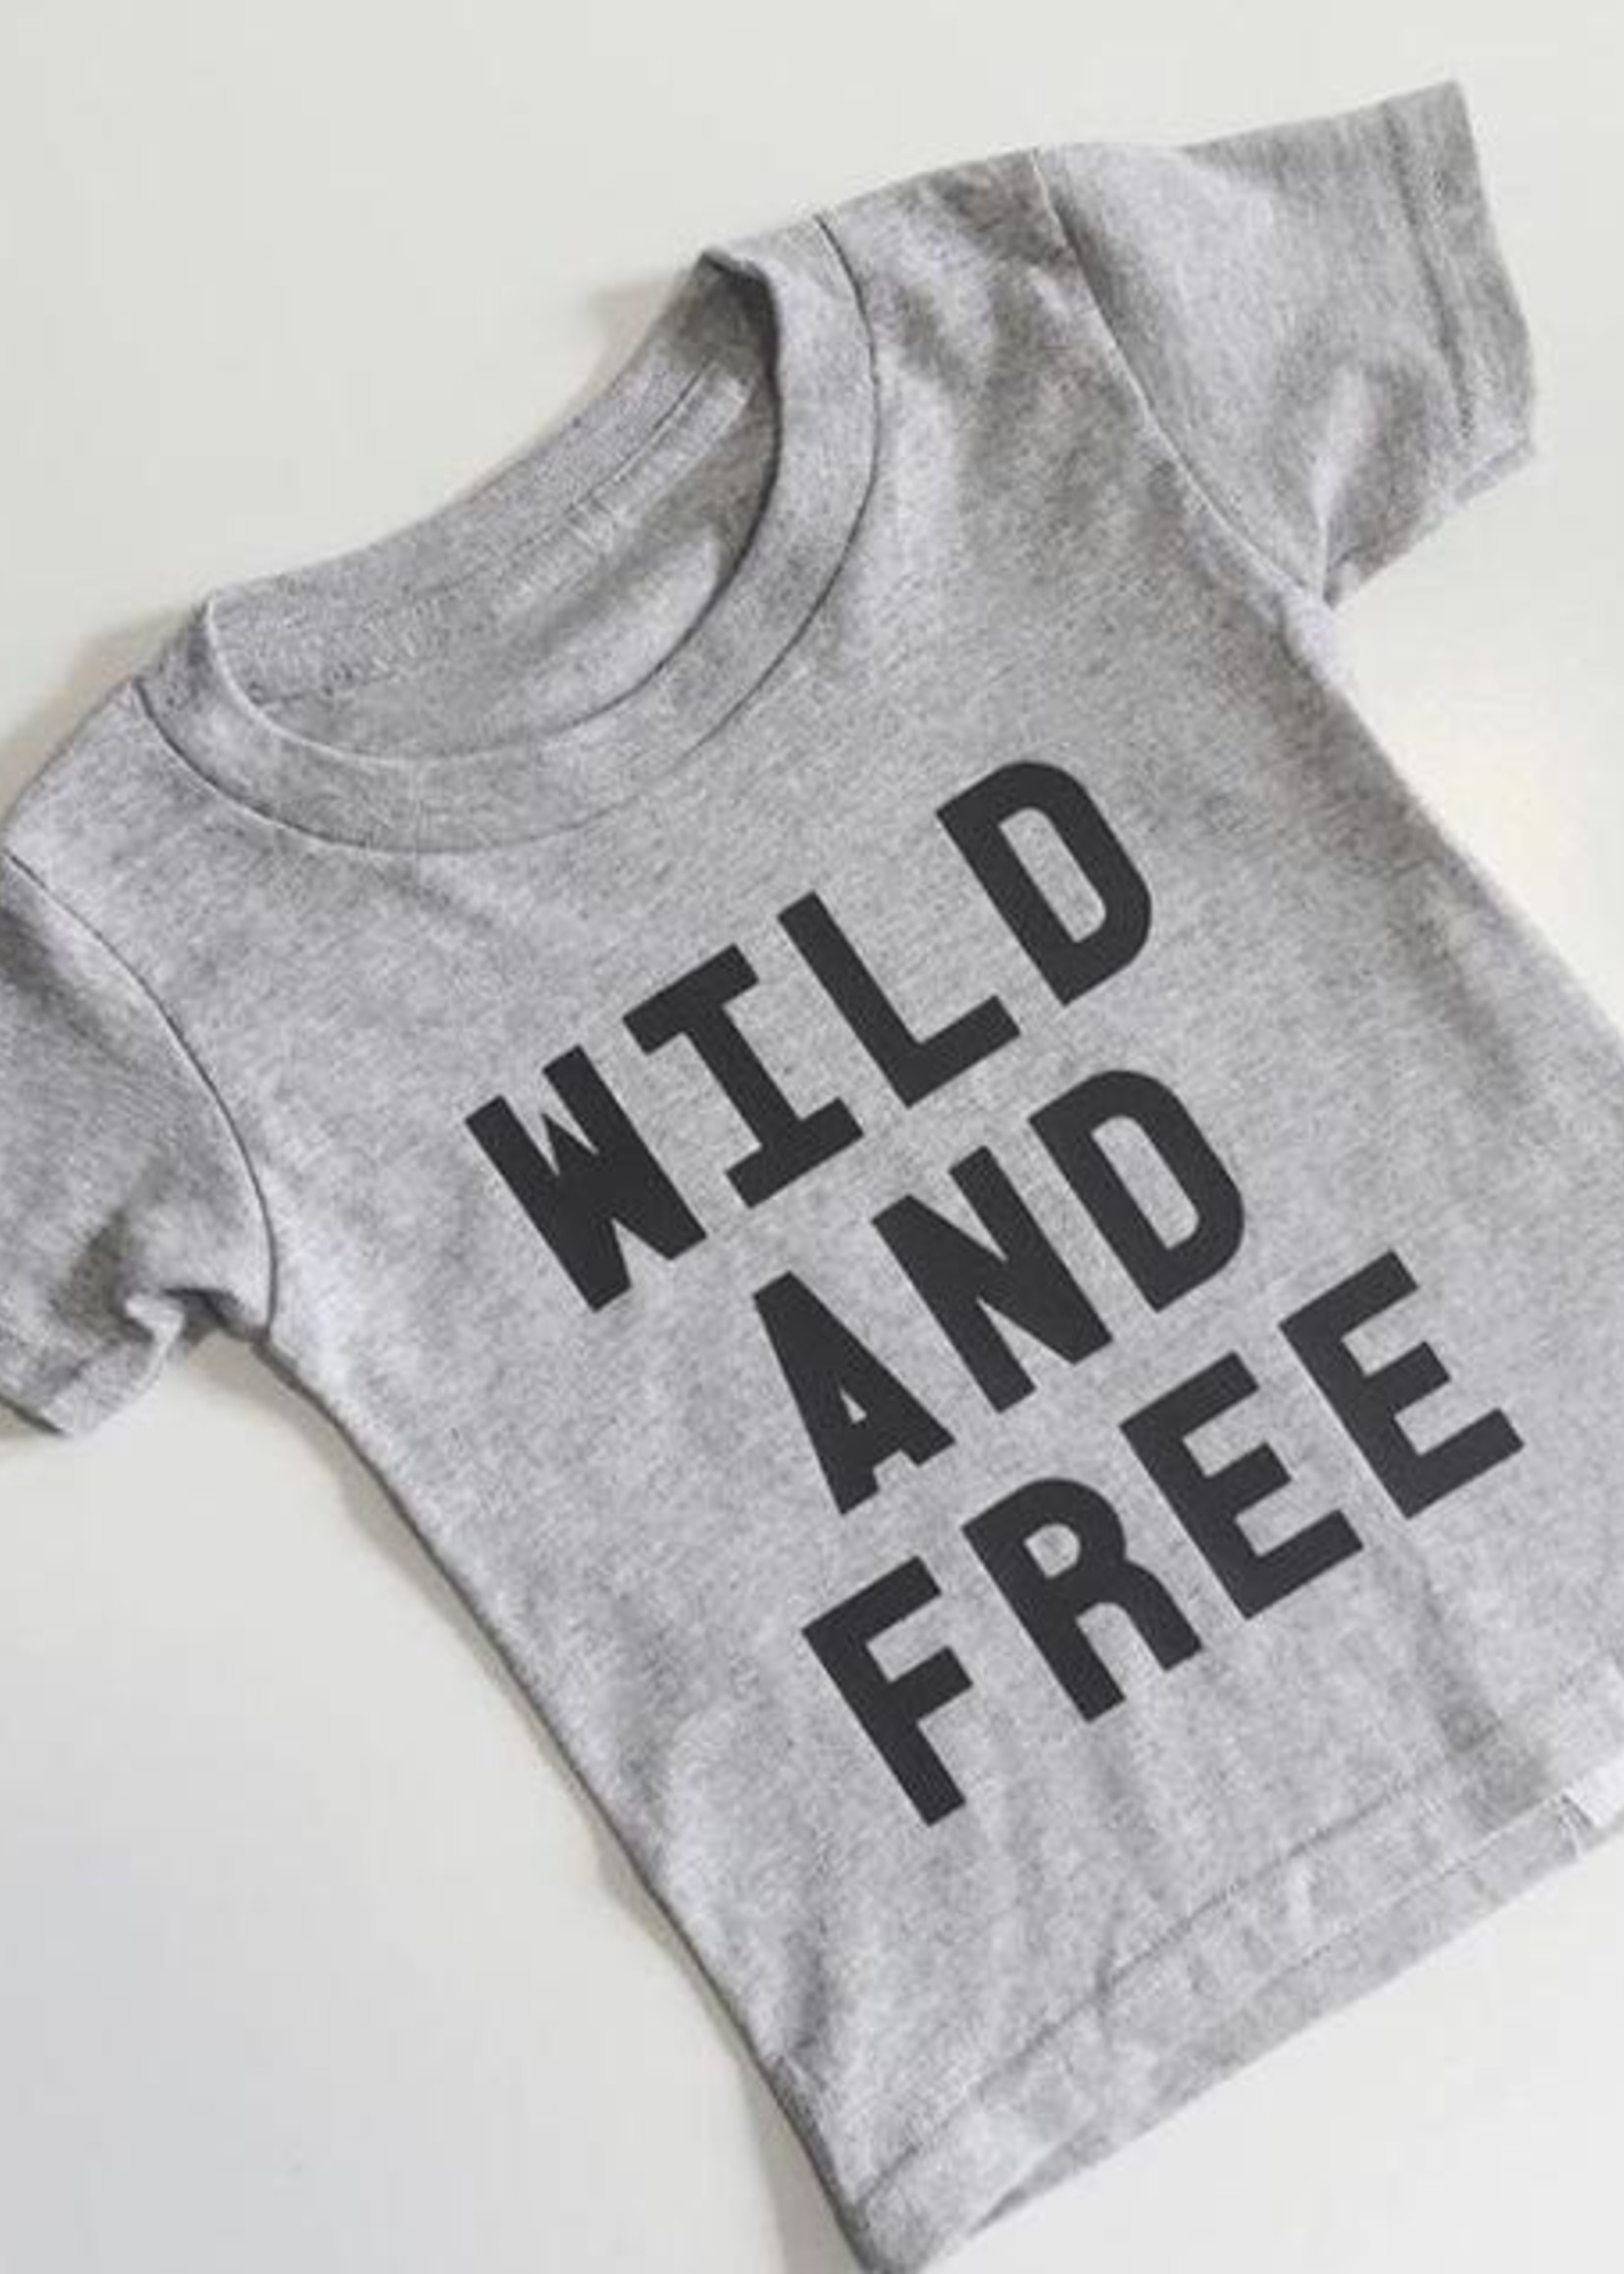 West Coast Wild Child Wild And Free T-Shirt